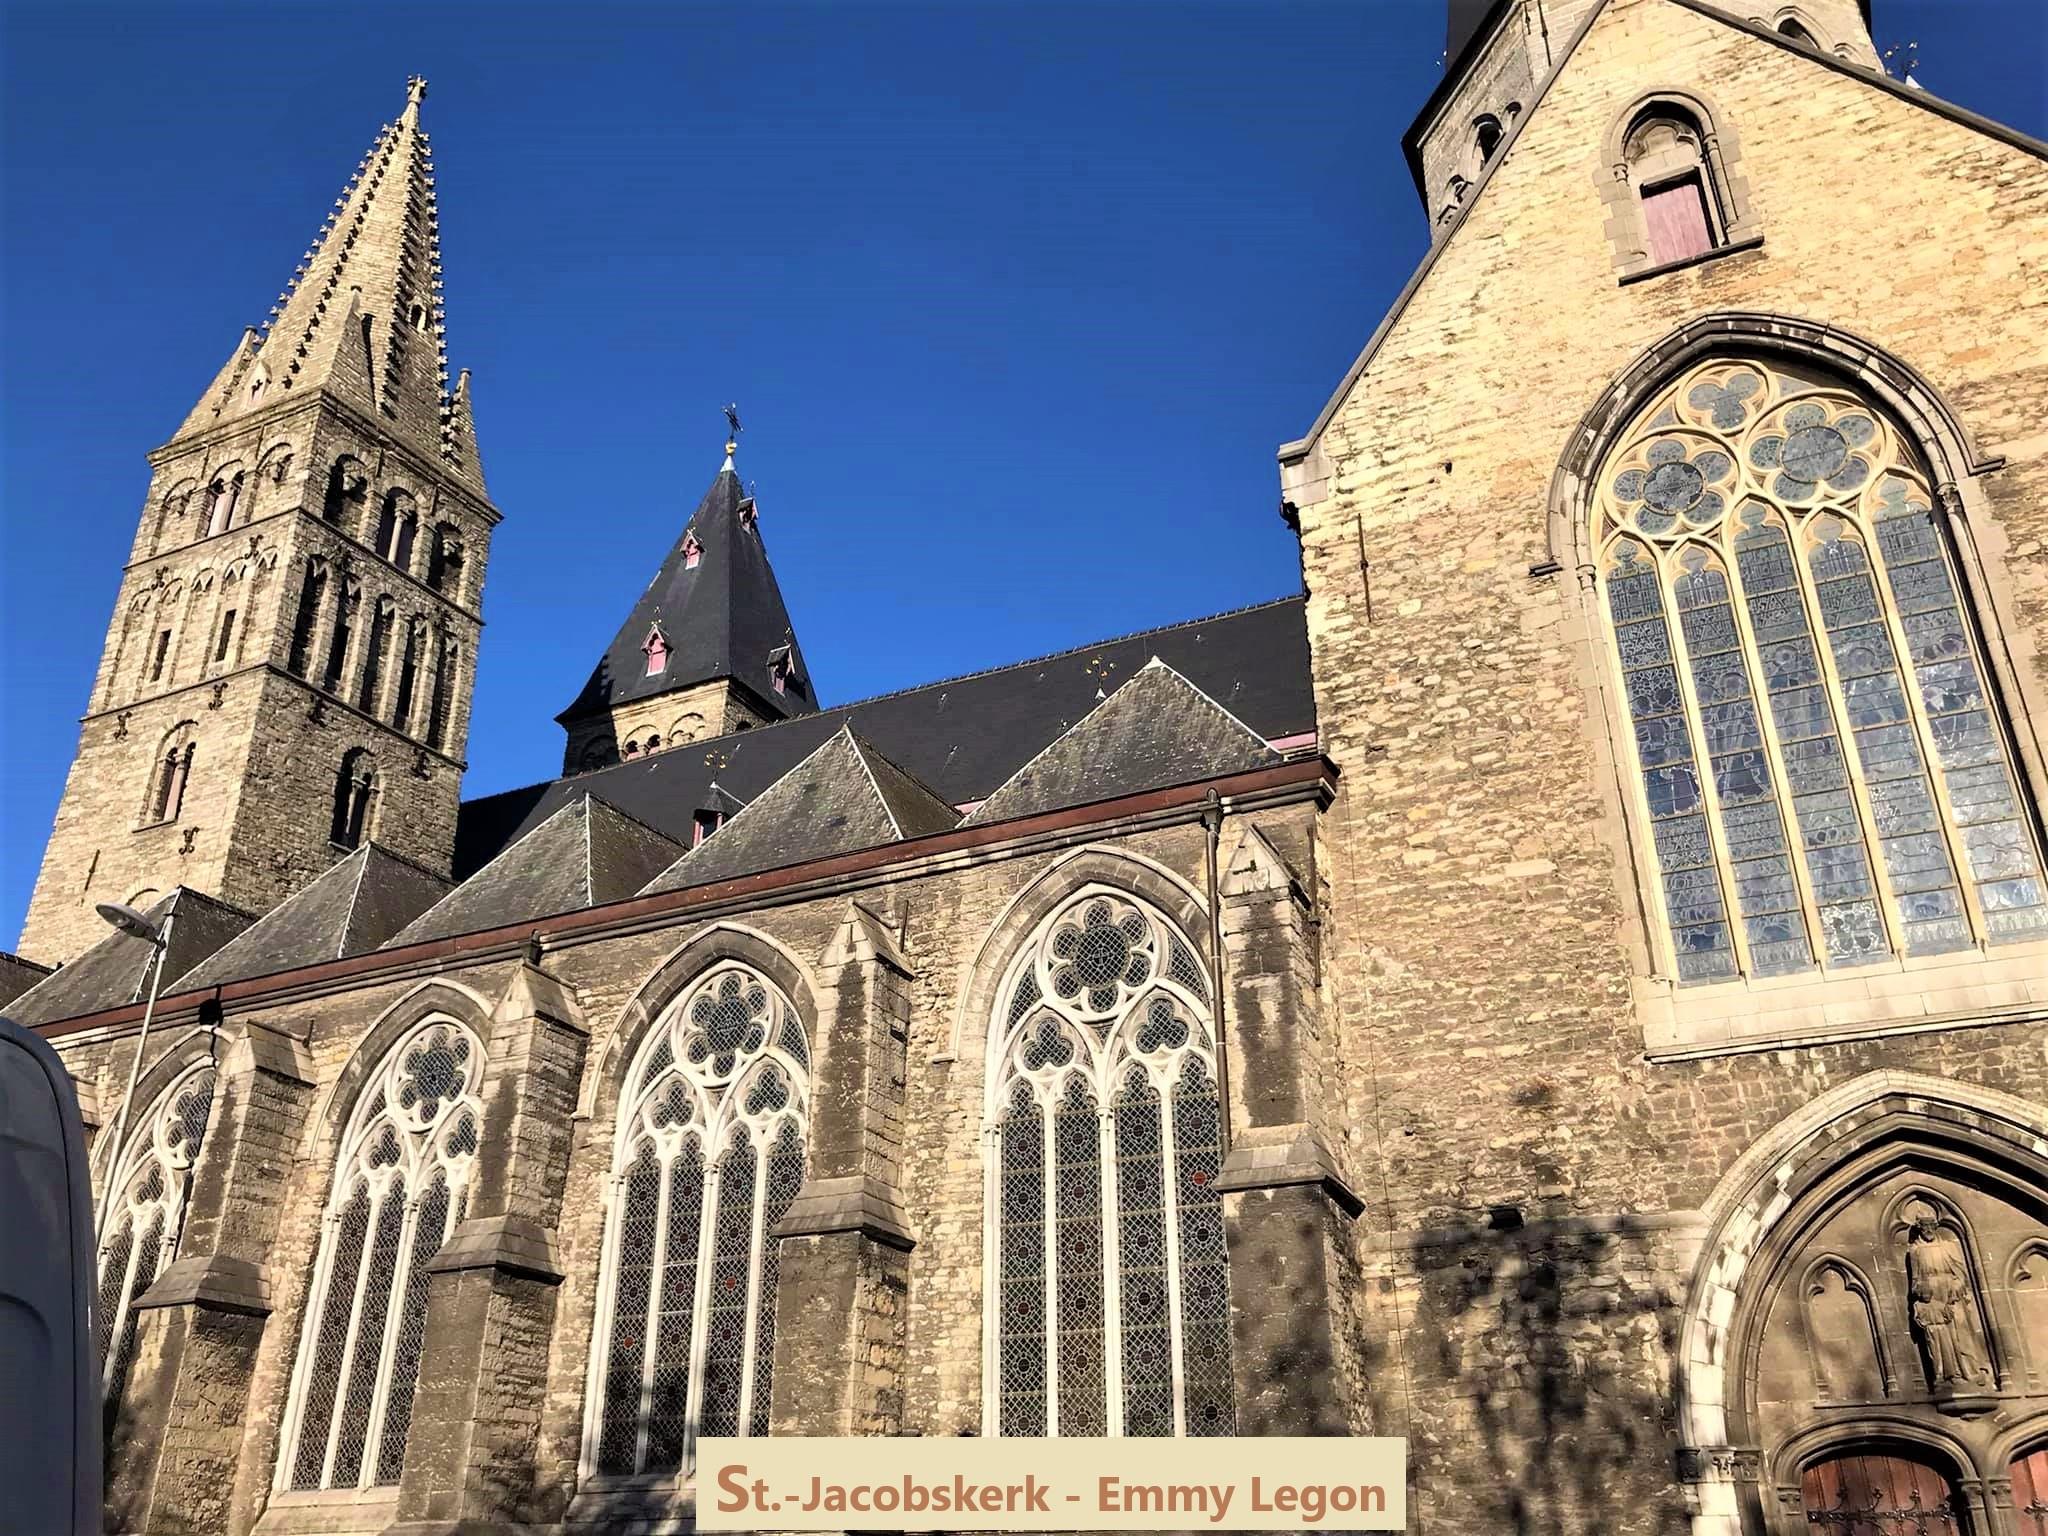 GentEmmyLegonStJacobskerk18.11.2020